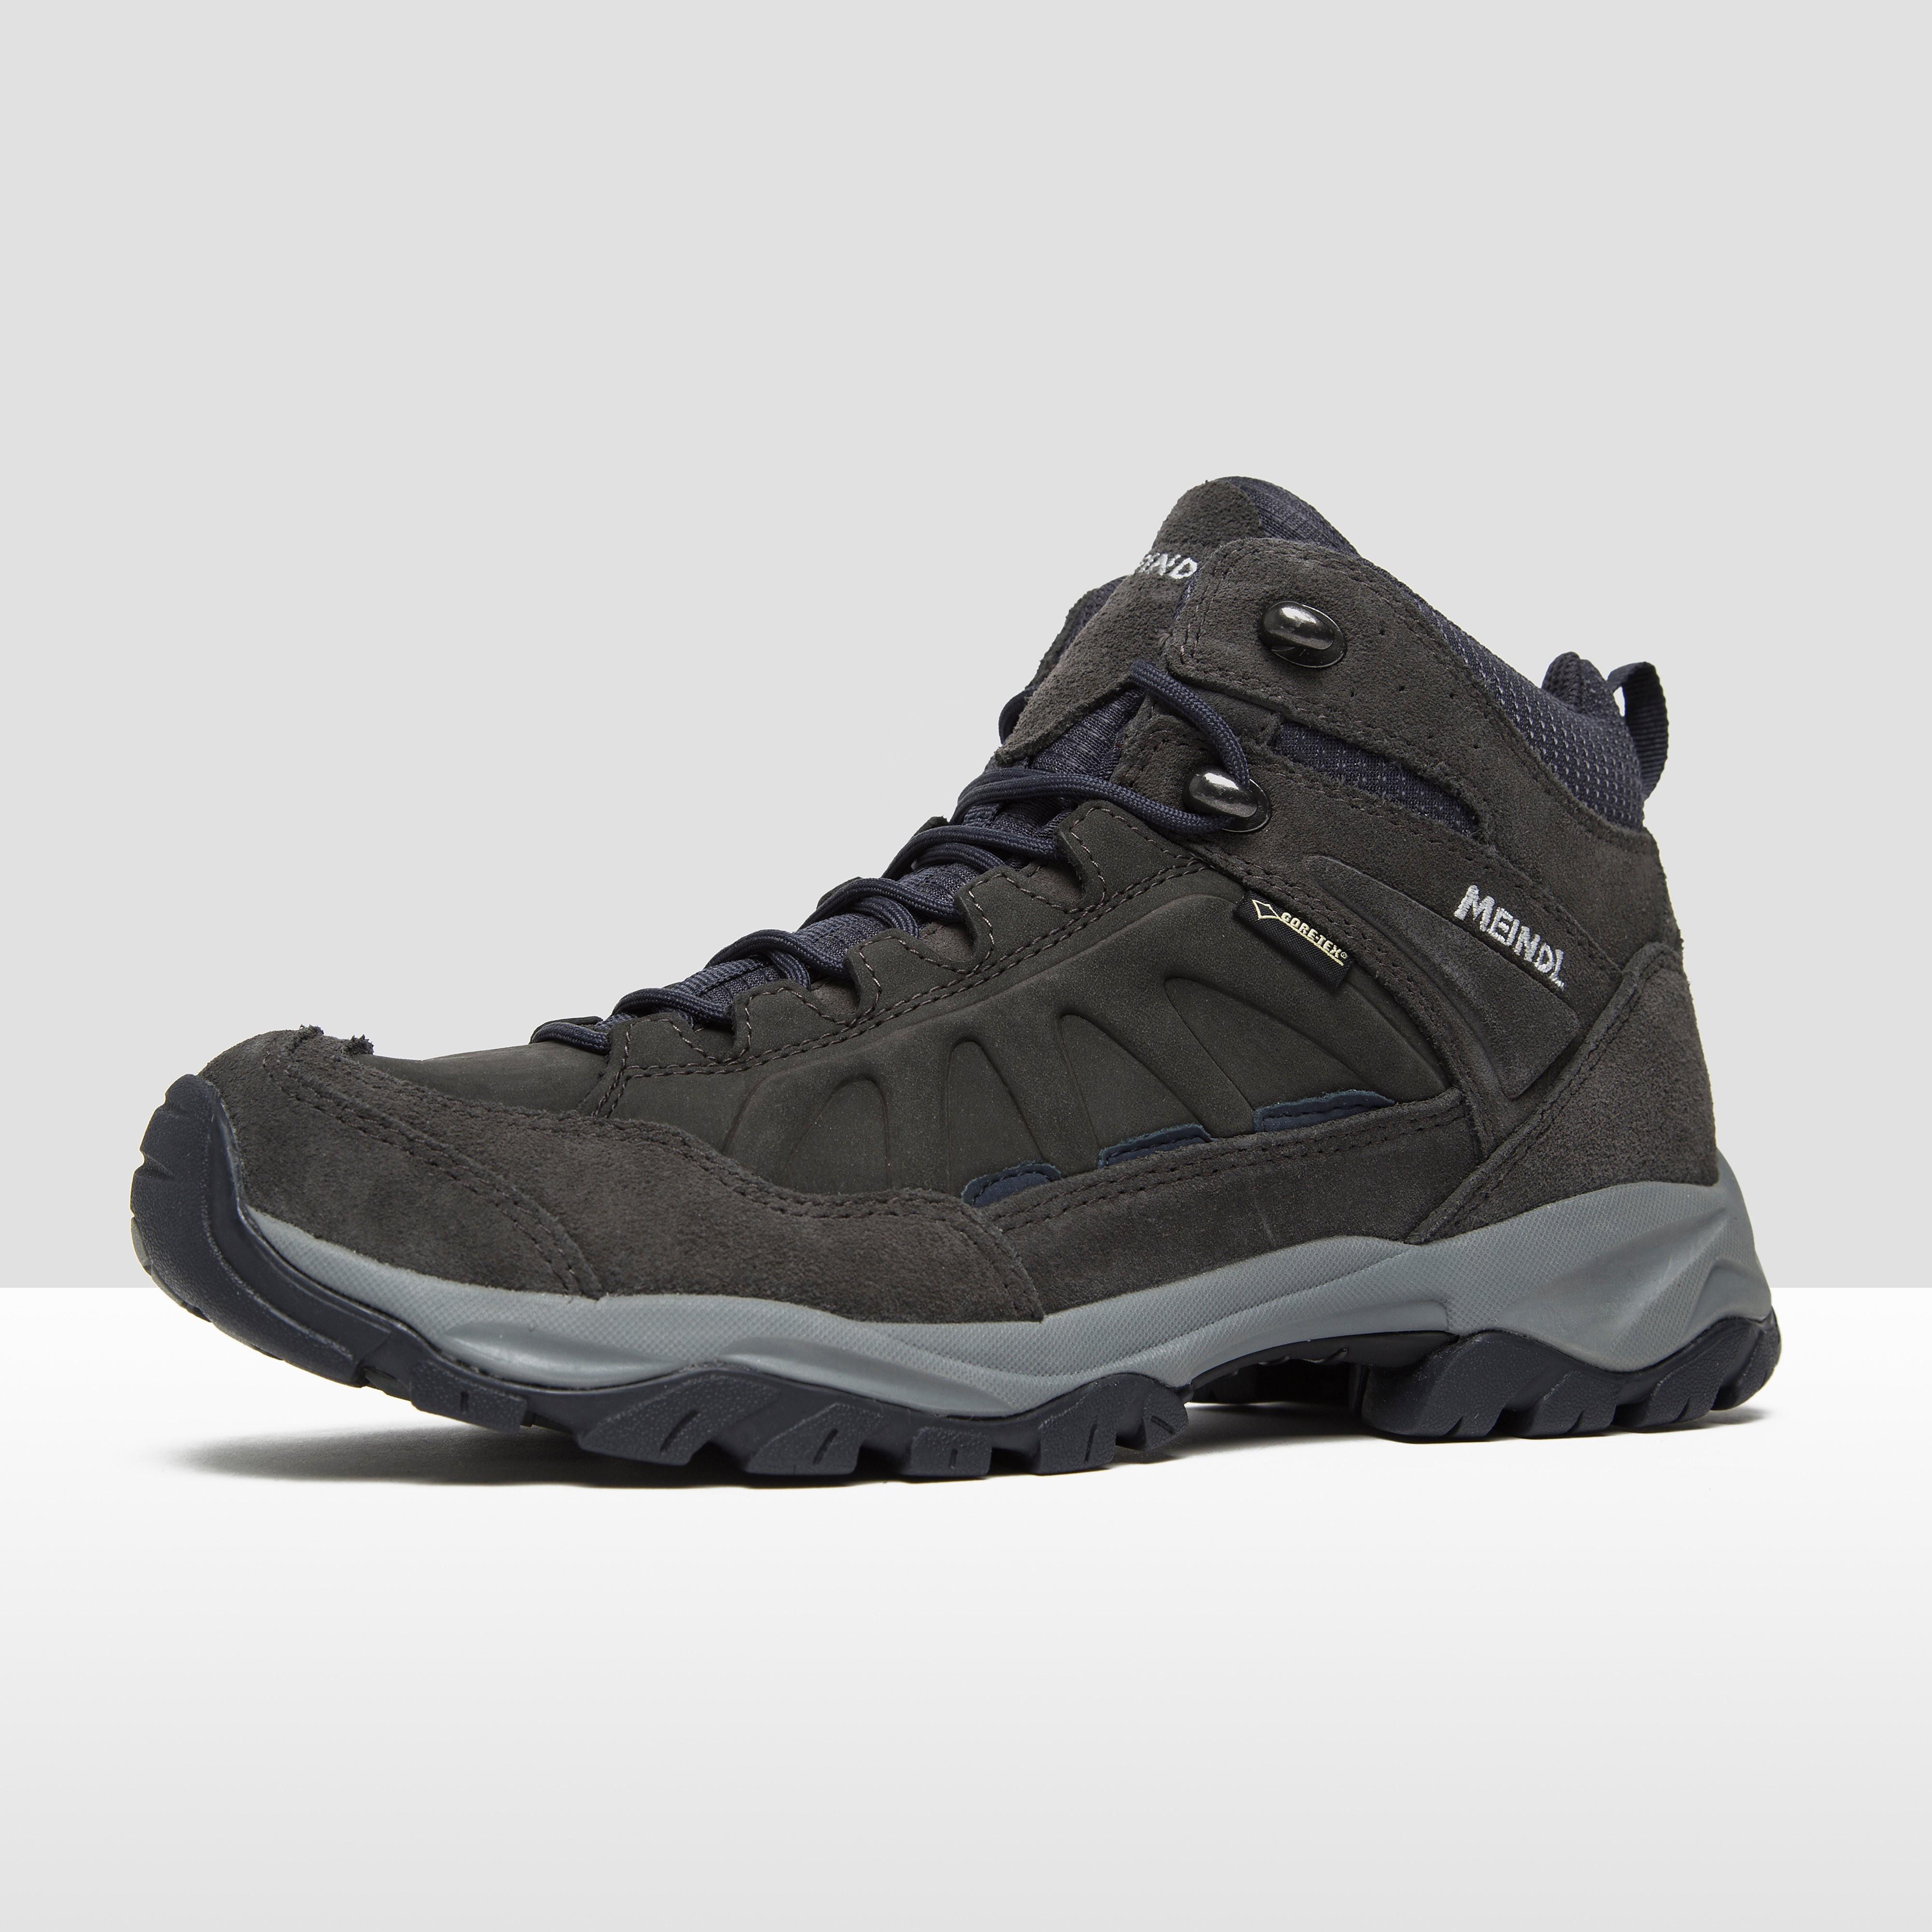 Meindl  Nebraska Mid GTX Men's Walking Boots